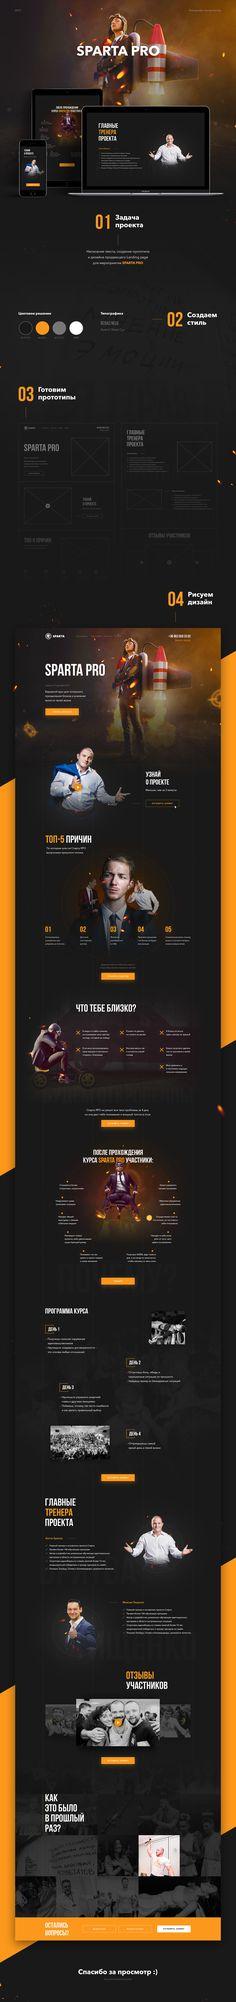 SPARTA PRO — Landing Page